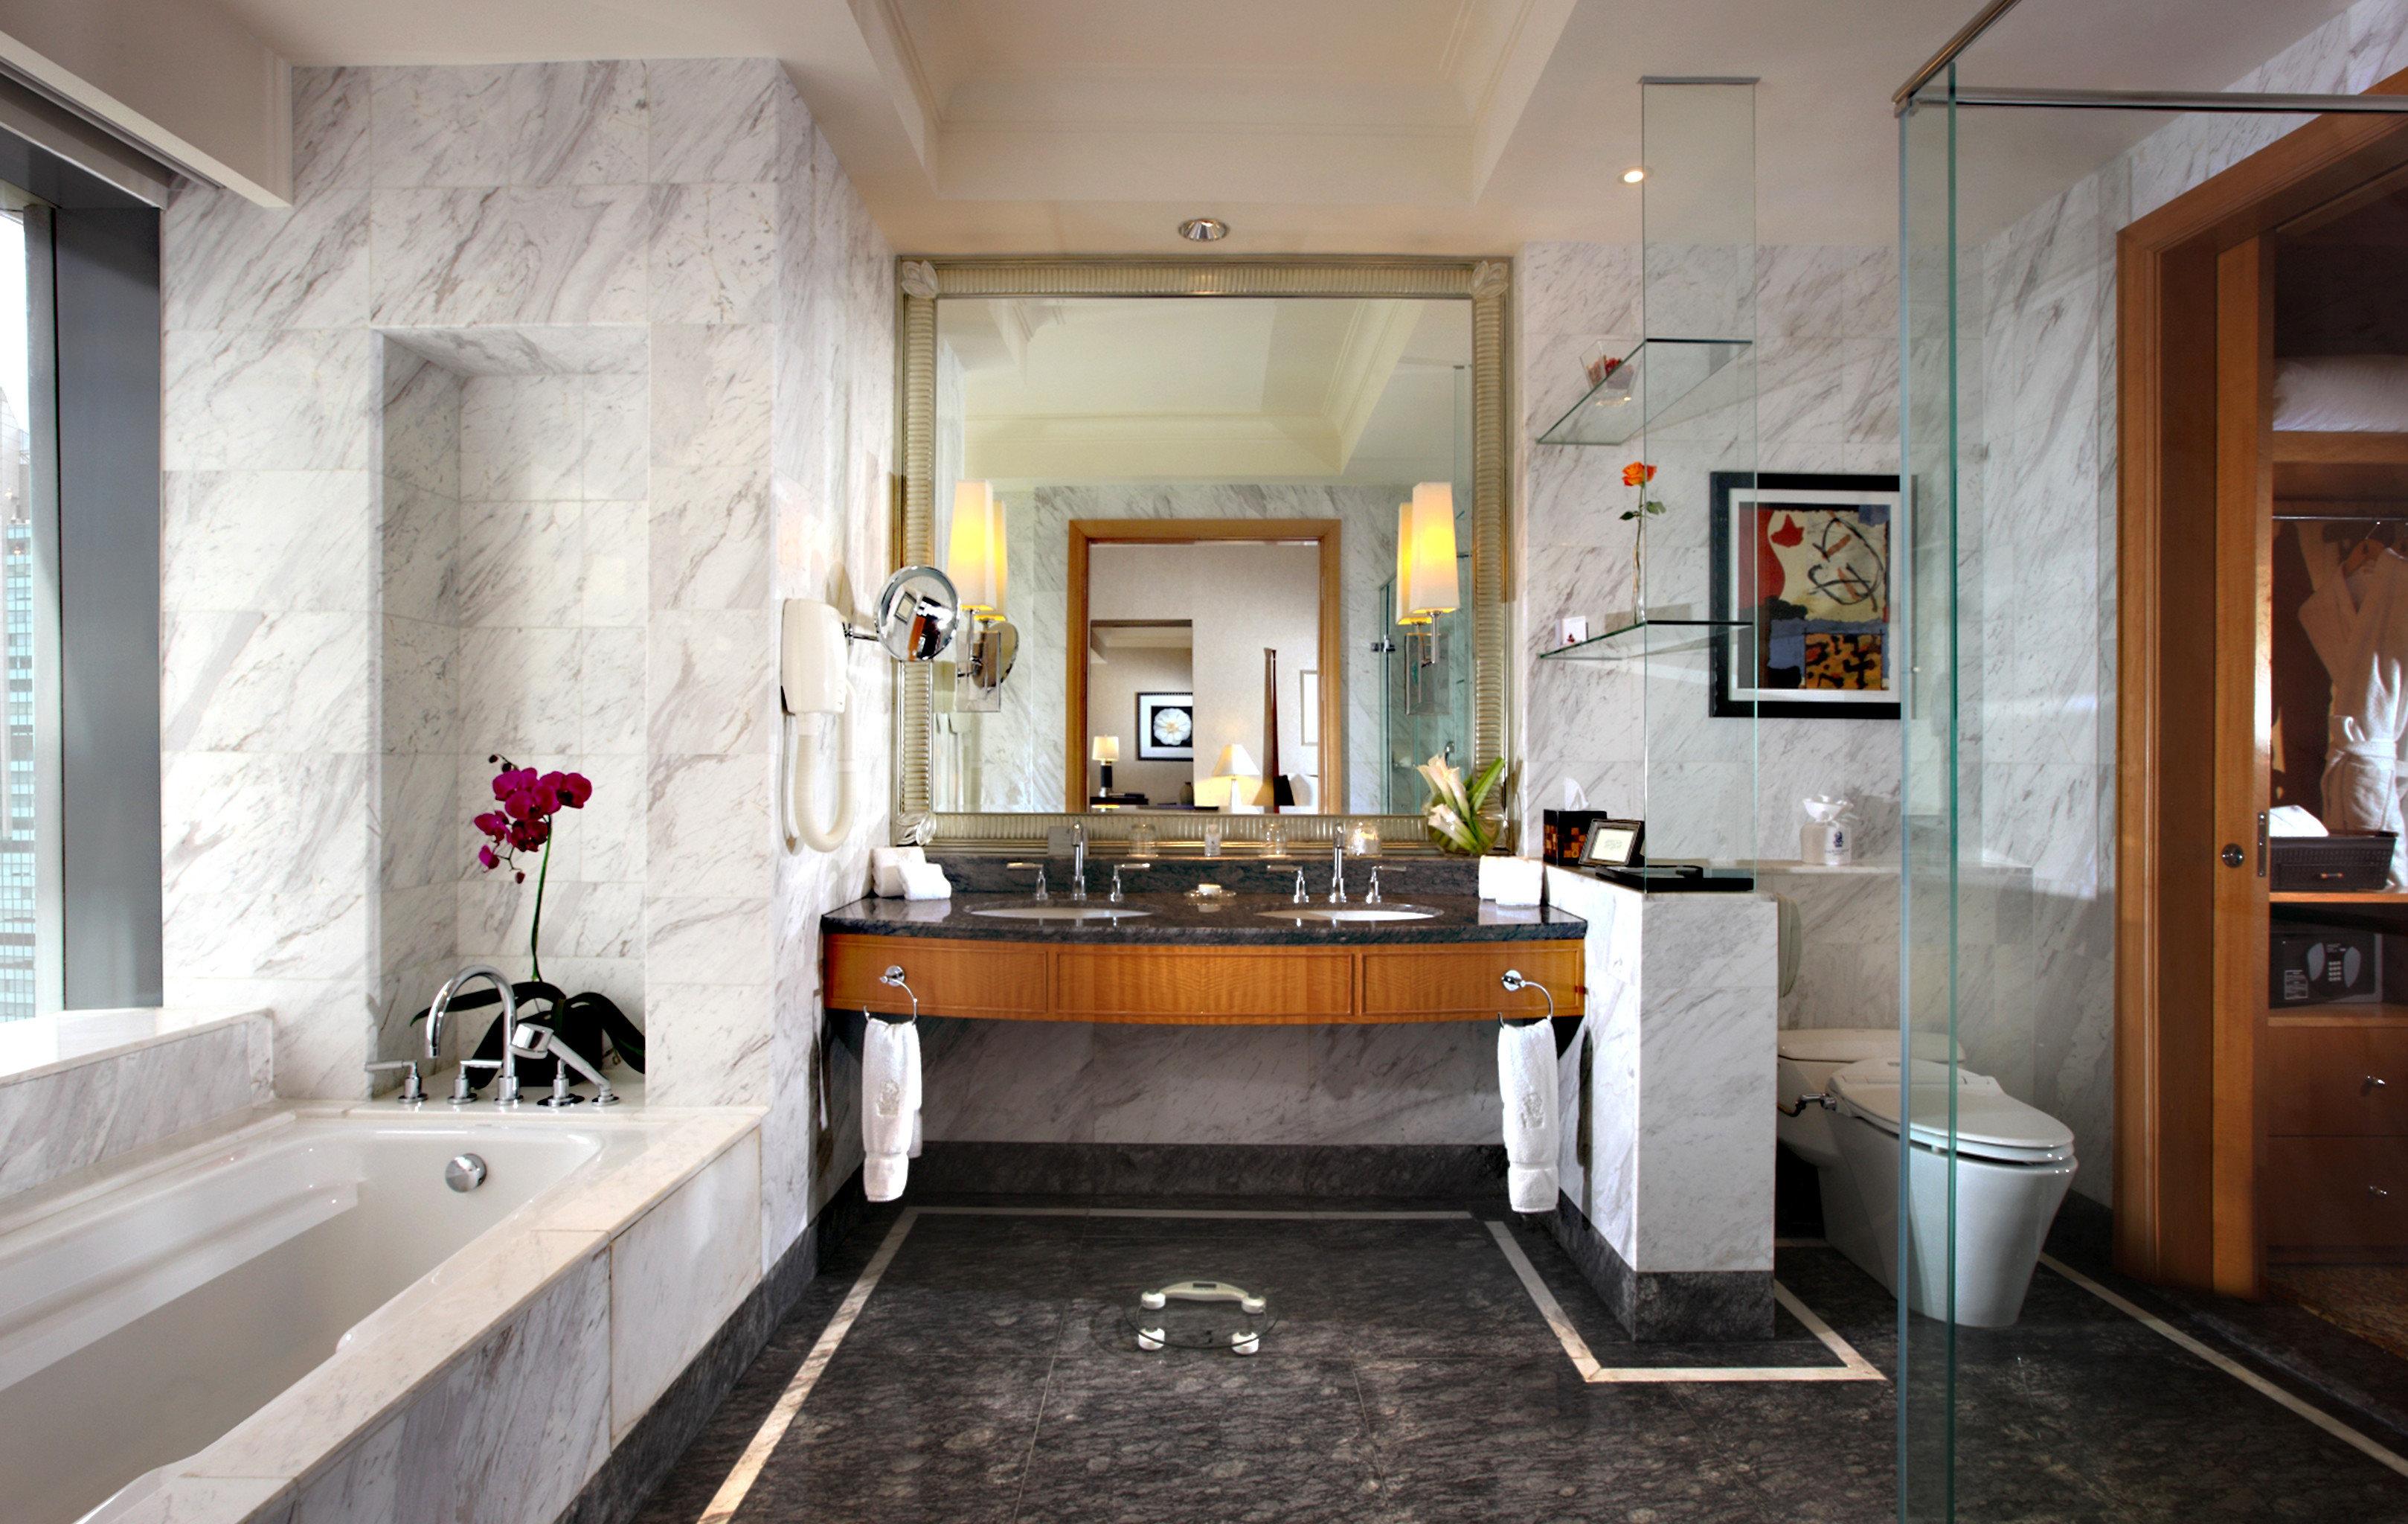 Bath property bathroom home cottage Suite mansion countertop Kitchen farmhouse cabinetry stone